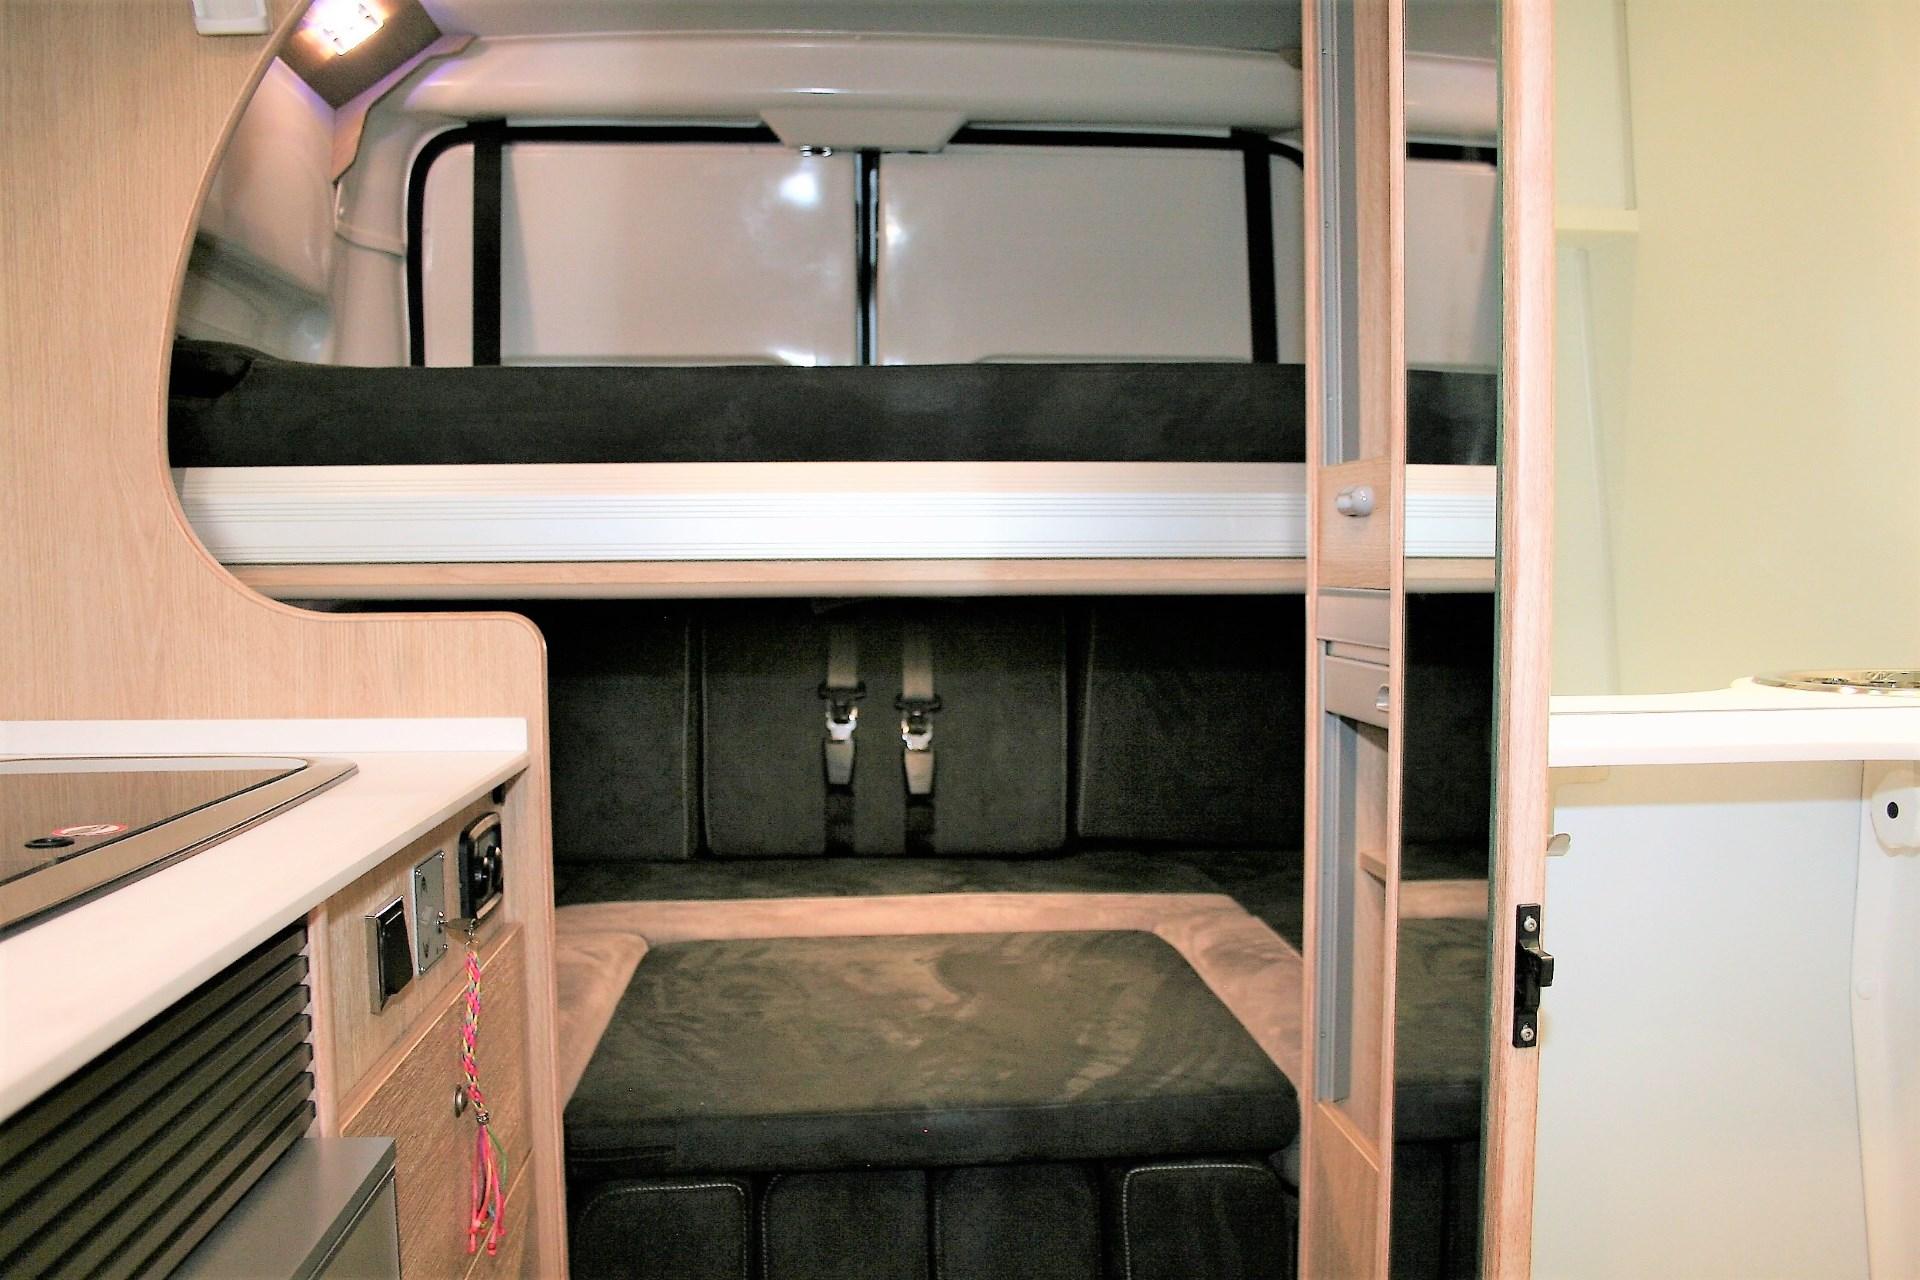 Family S L2H2 Fiat Ducato Bunkervan (6)